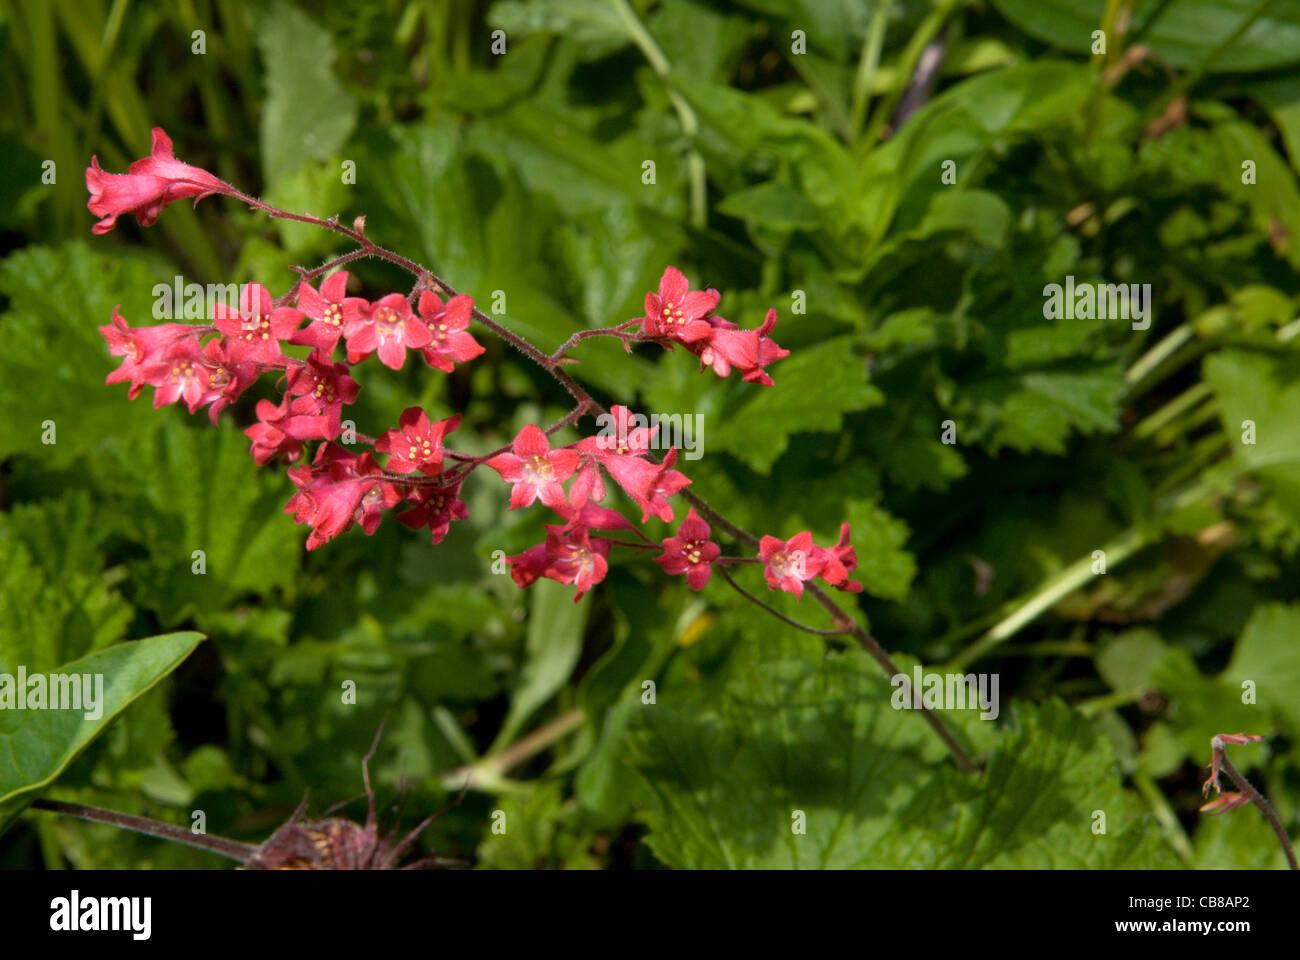 Tiny coral pink flowers of a heuchera plant stock photo 41366026 tiny coral pink flowers of a heuchera plant mightylinksfo